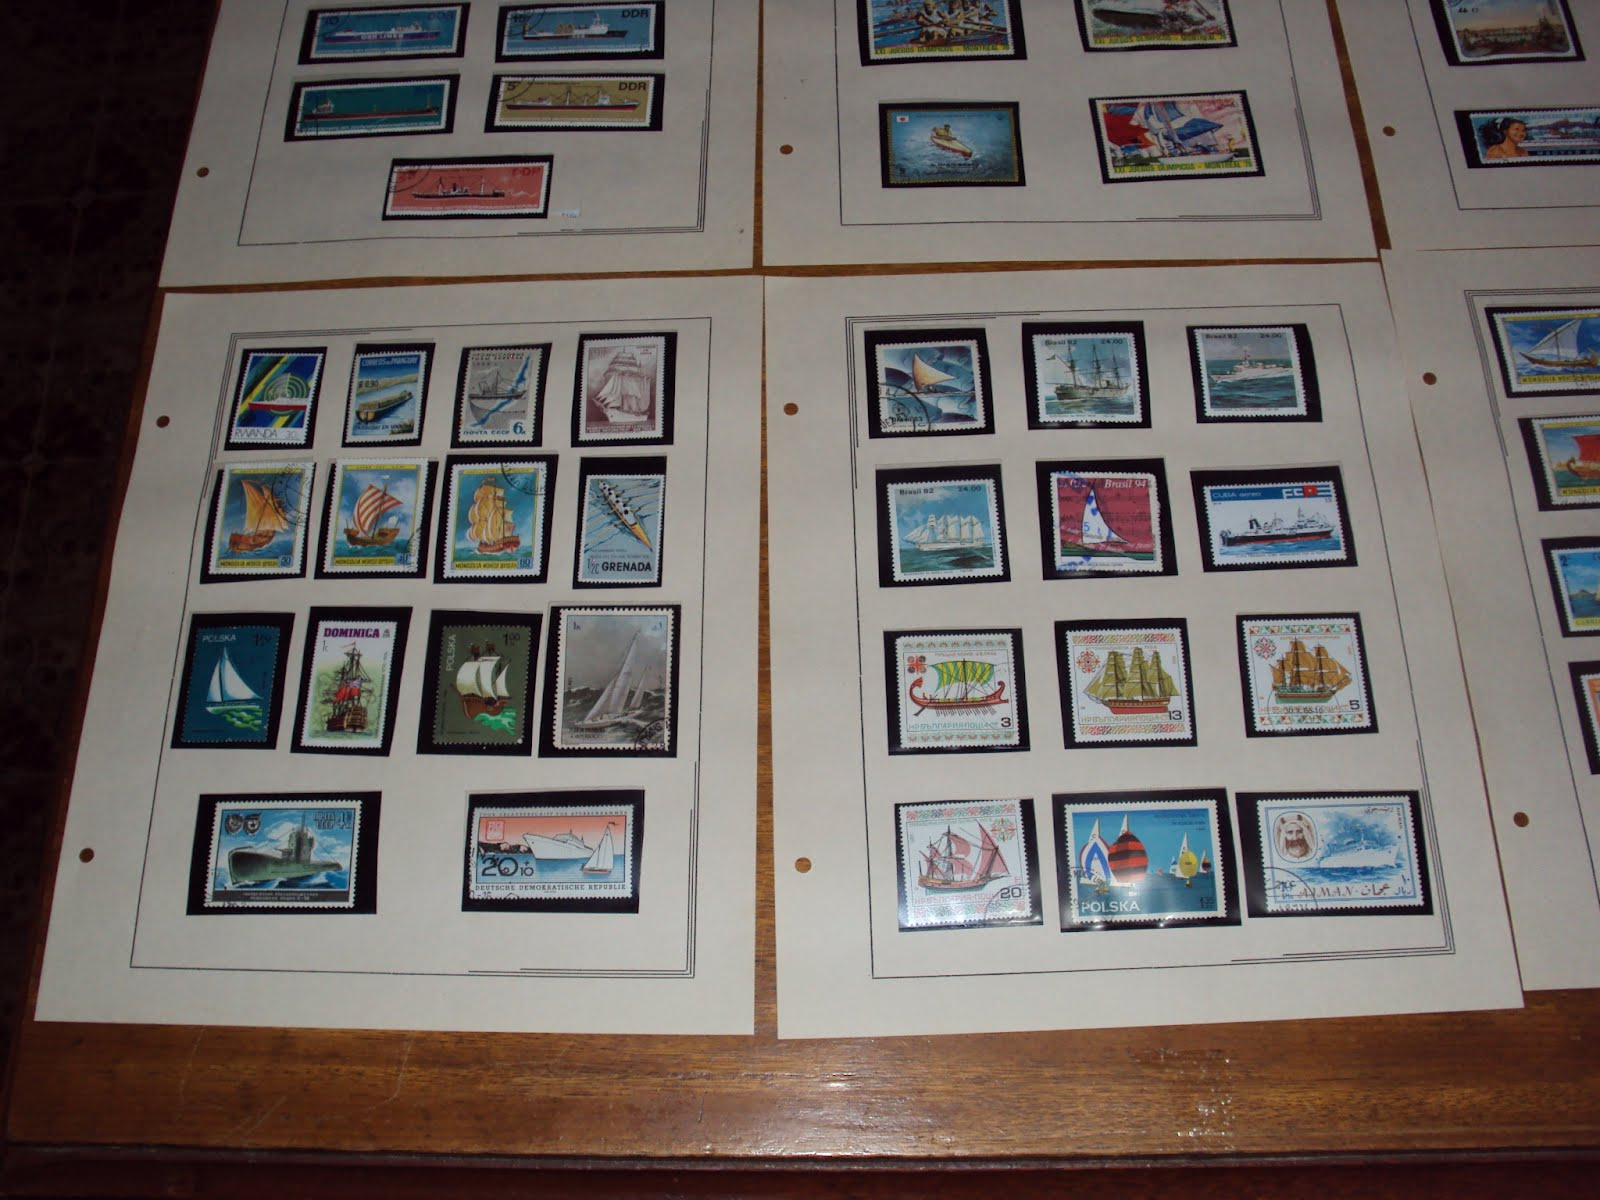 papeis+de+carta+e+selos+031.JPG (1600×1200)